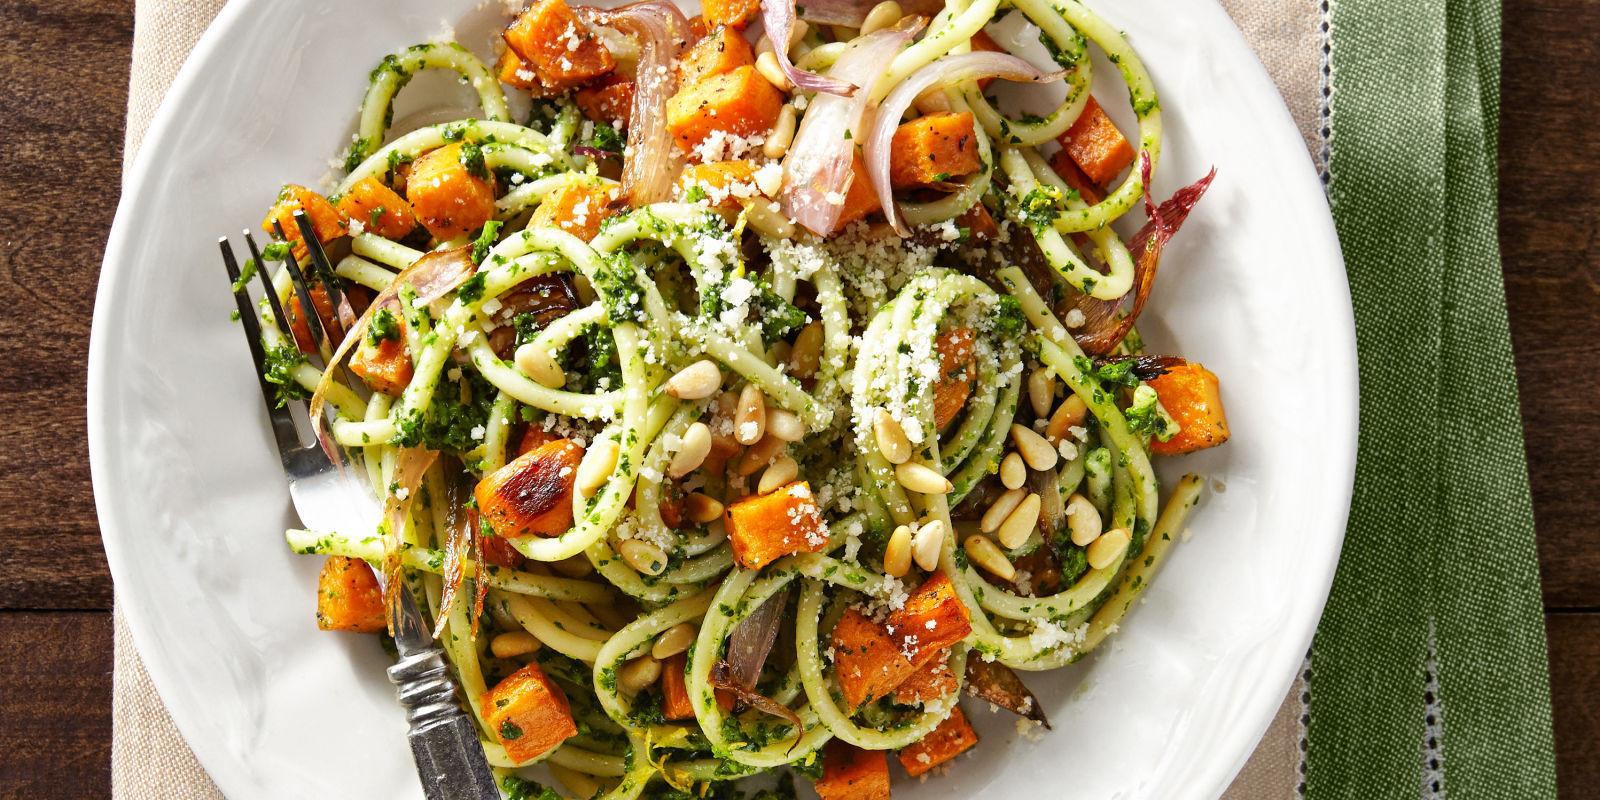 Pasta Dinner Ideas  45 Easy Pasta Dinner Recipes Best Family Pasta Dishes